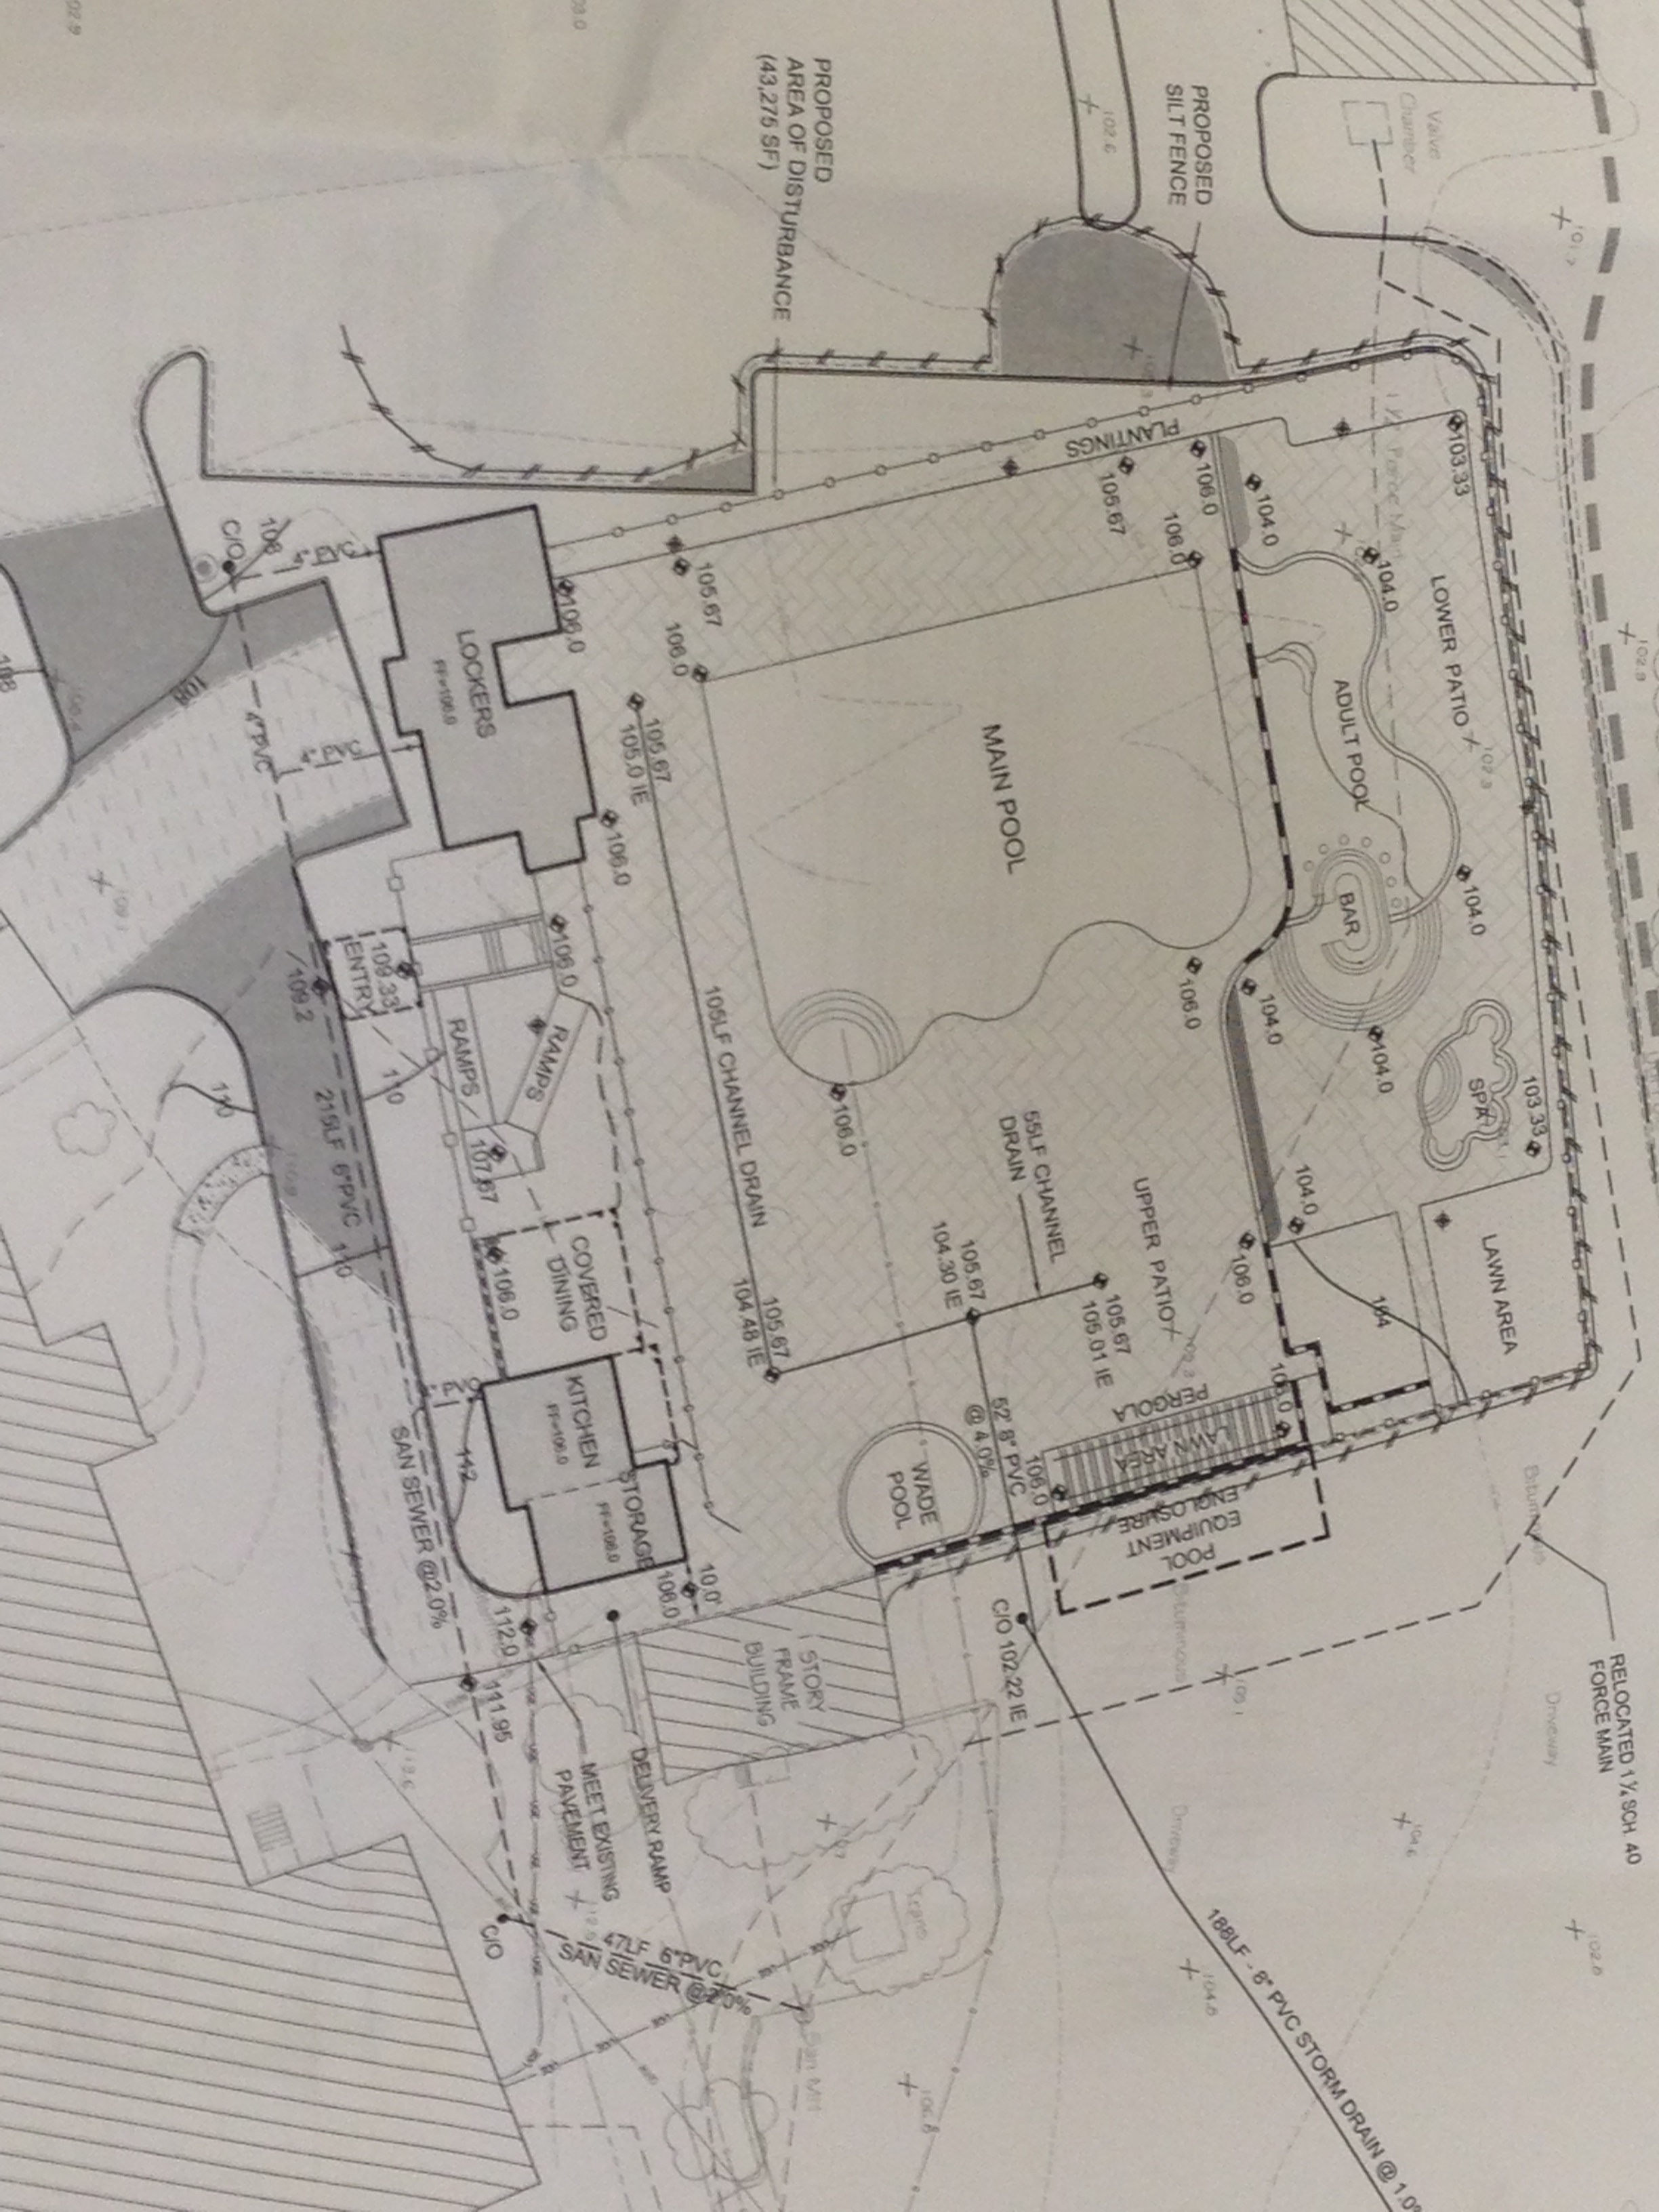 c28bda11c046a283541a_Engineer_Map.jpg